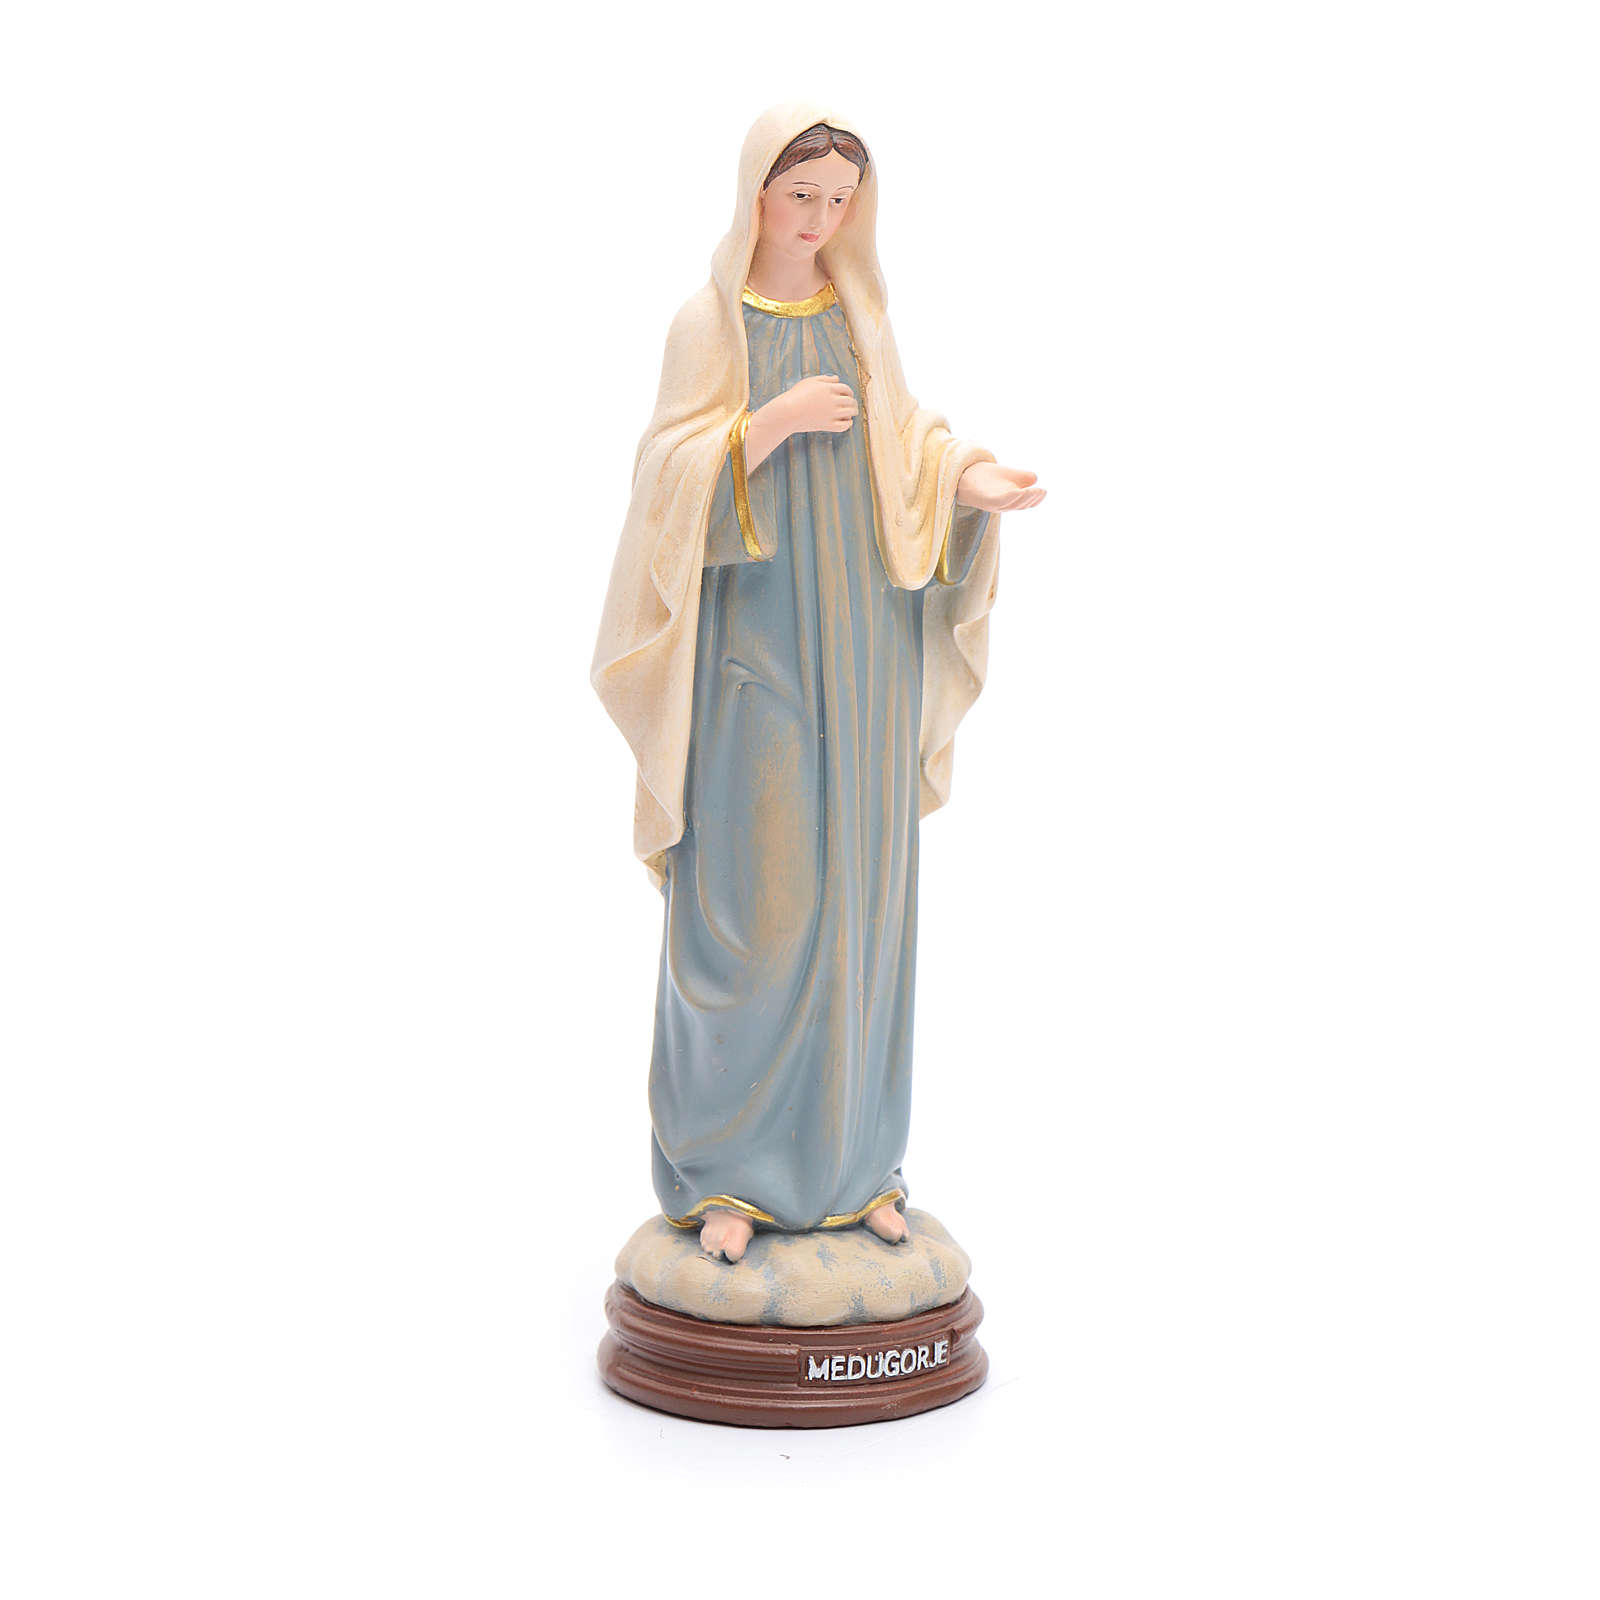 Estatua Virgen de Medjugorje de pasta de madera pintada 15 cm 4